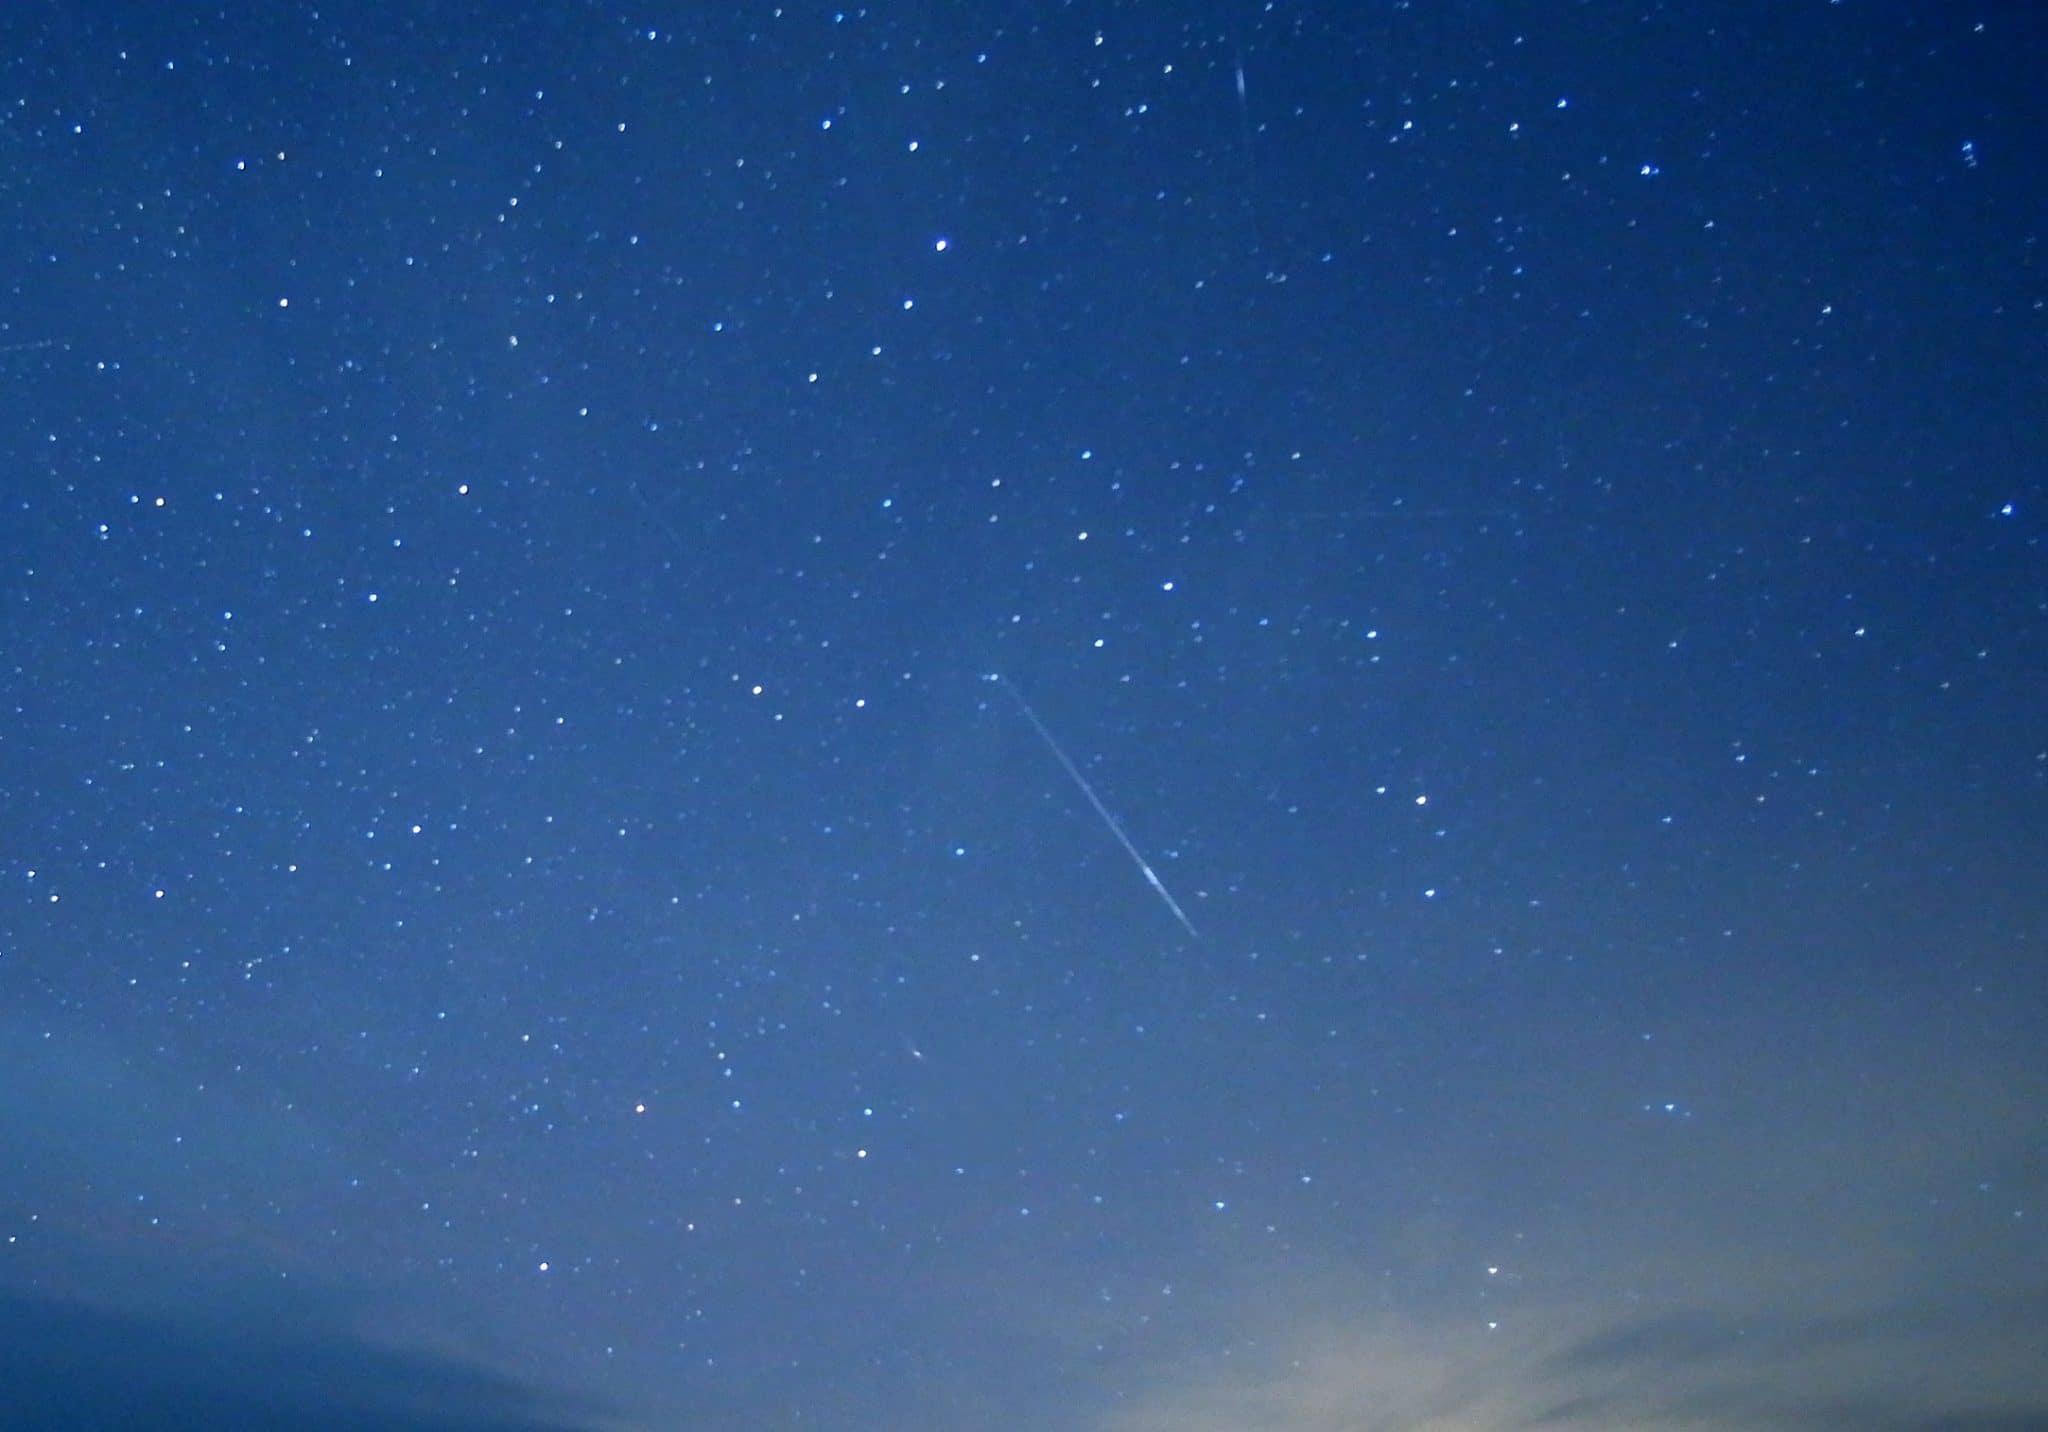 Ursid meteor